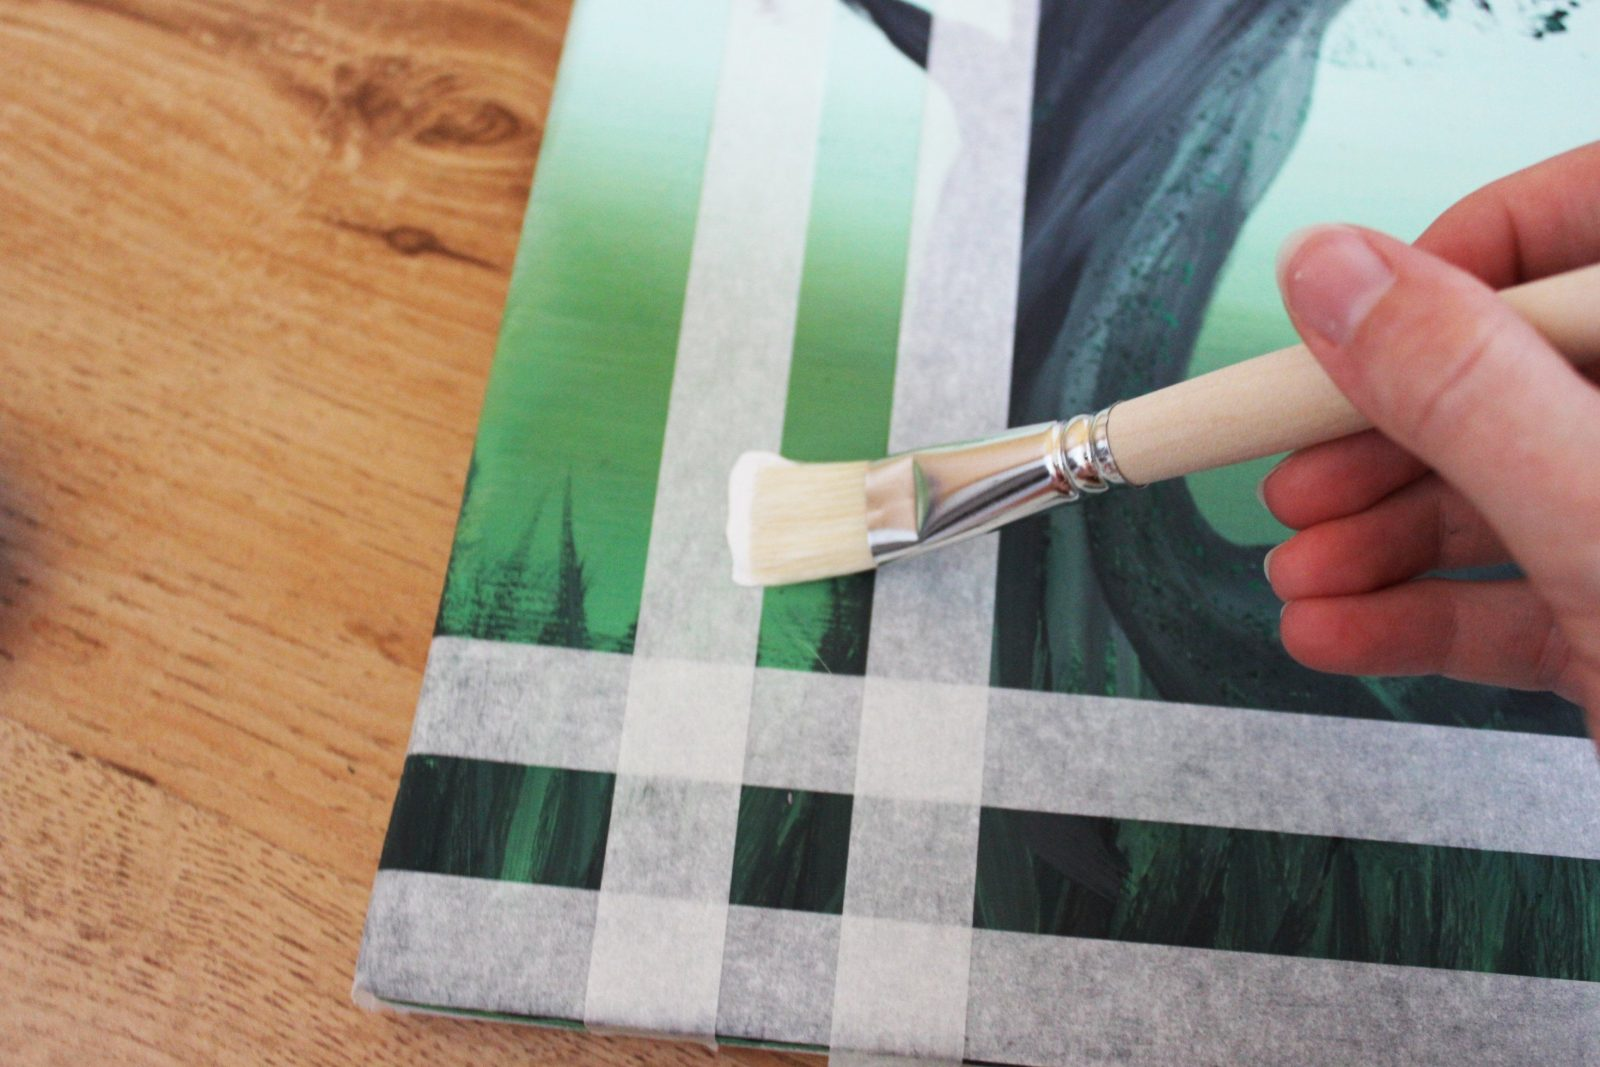 Bilder Selber Malen Auf Leinwand Bezaubernd Auf Kreative Deko Ideen